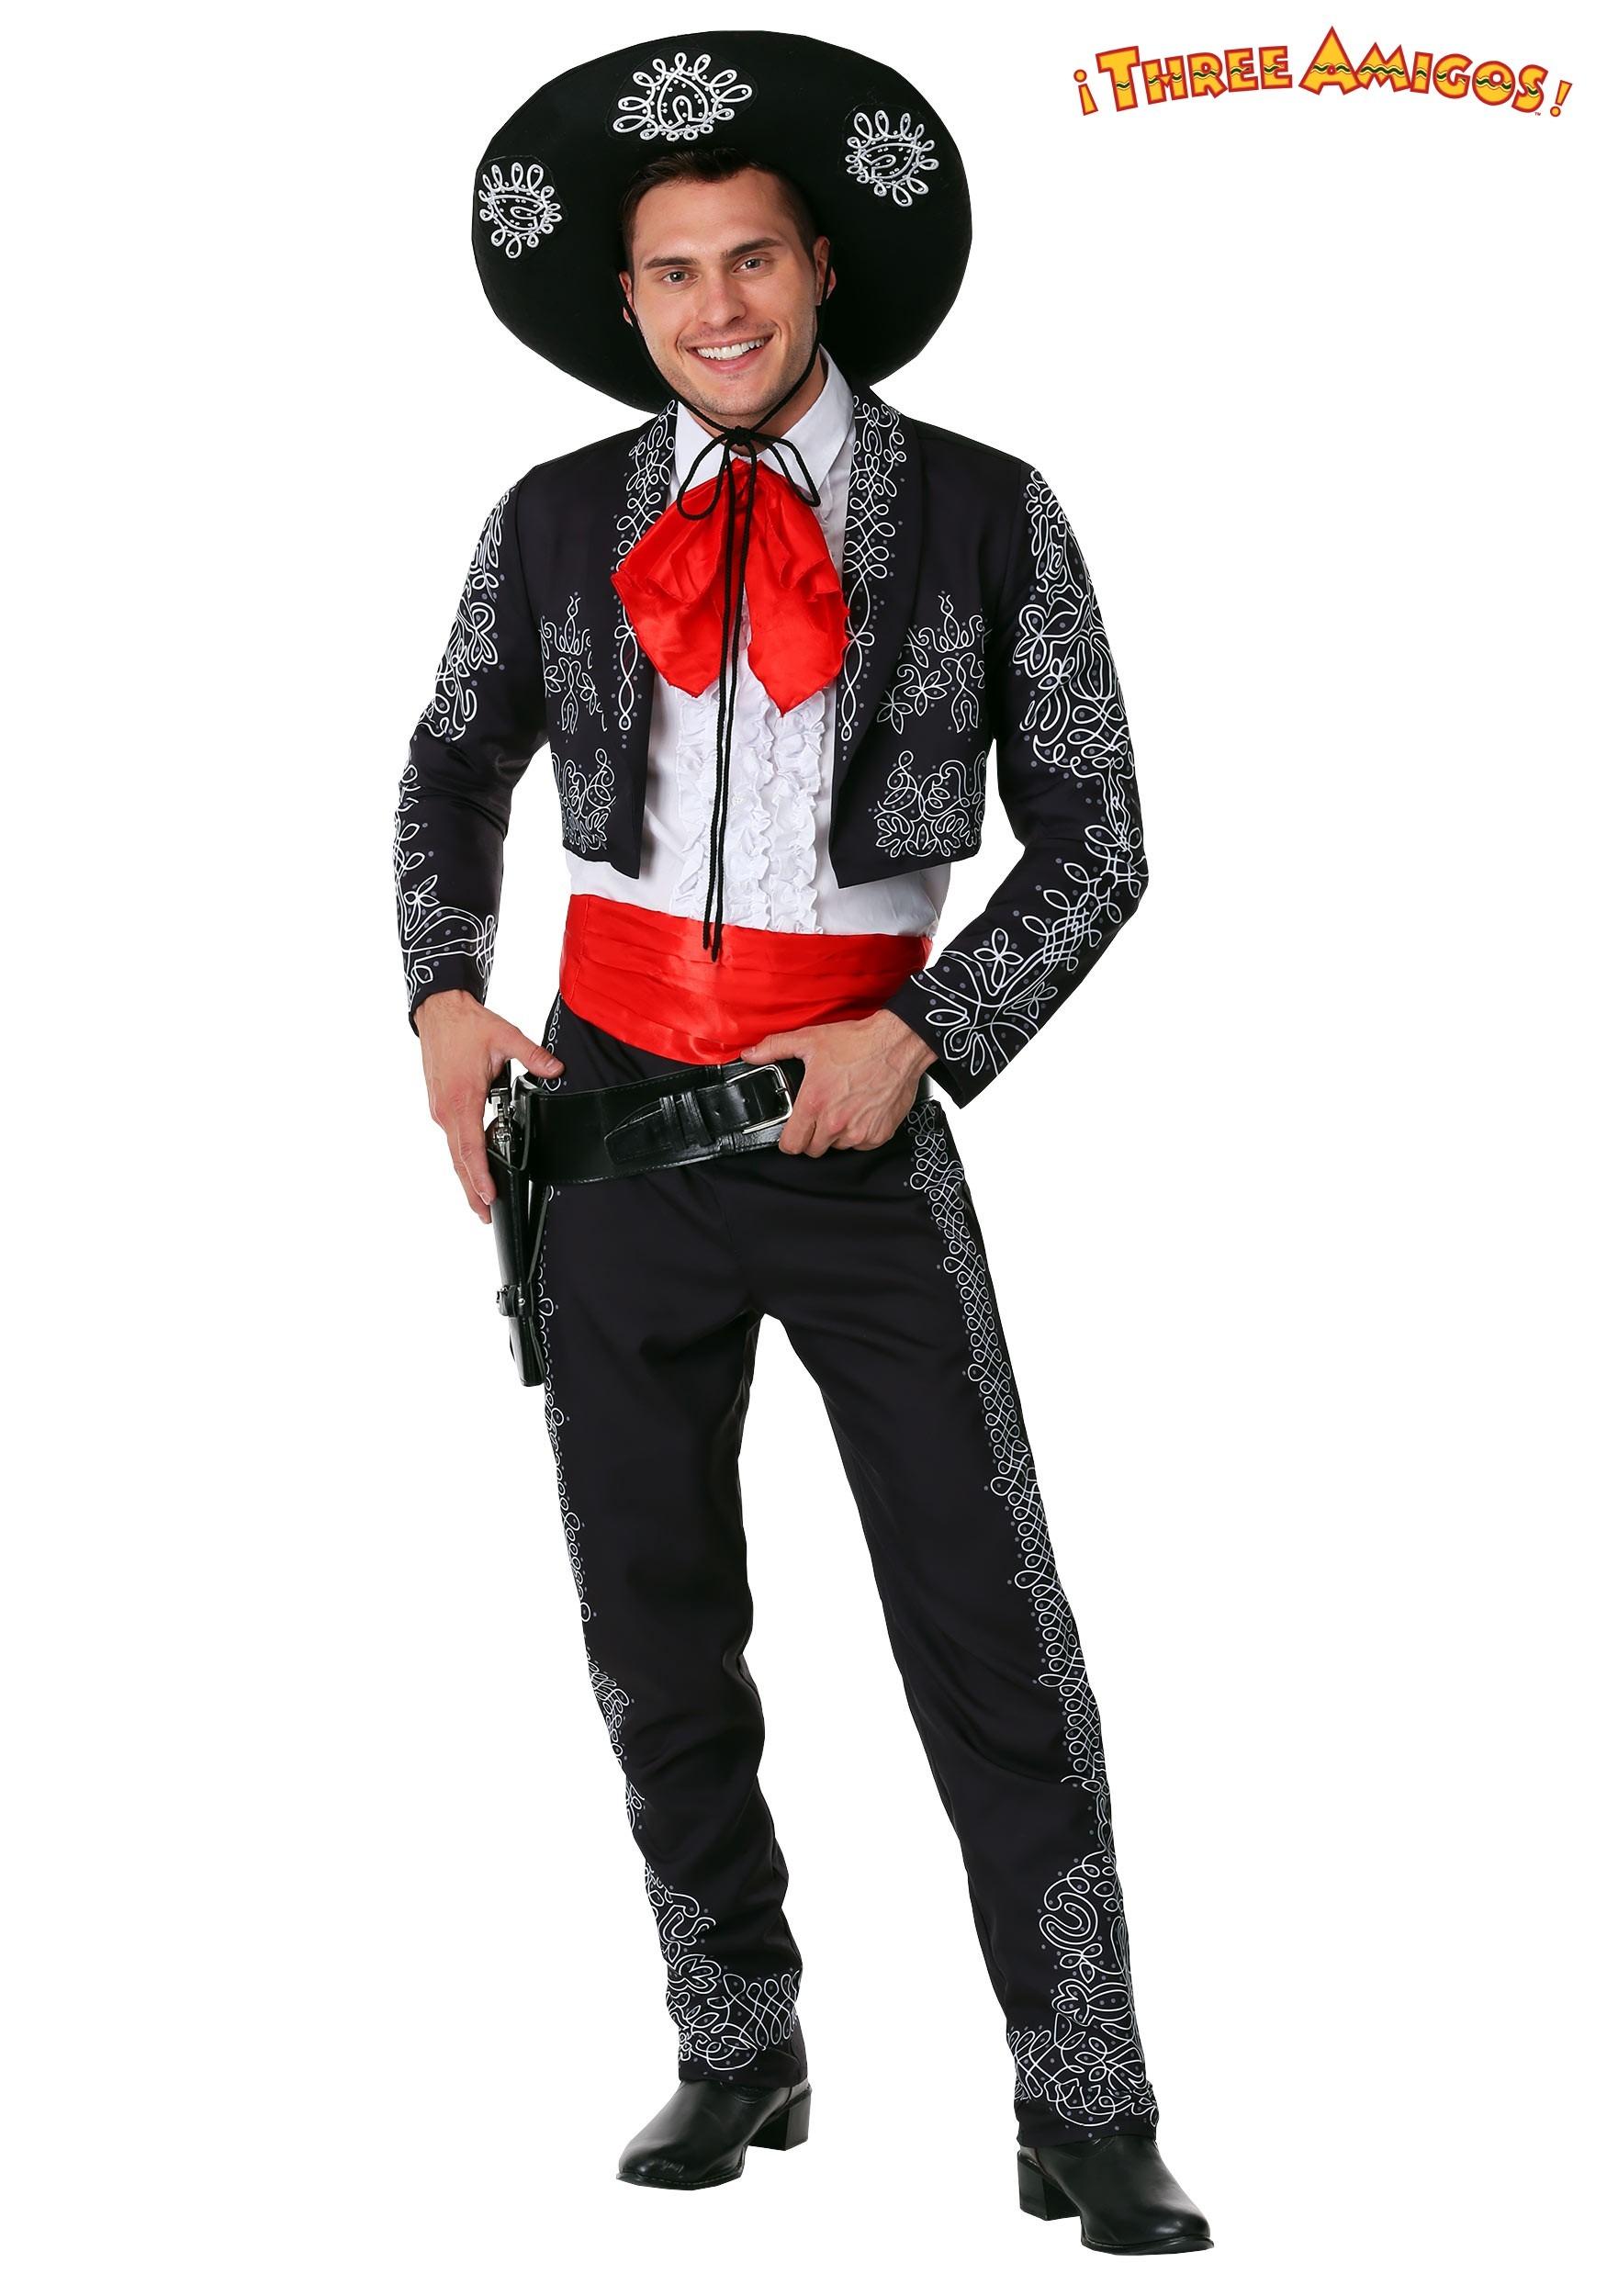 d45dc8d2 Men's Three Amigos Costume